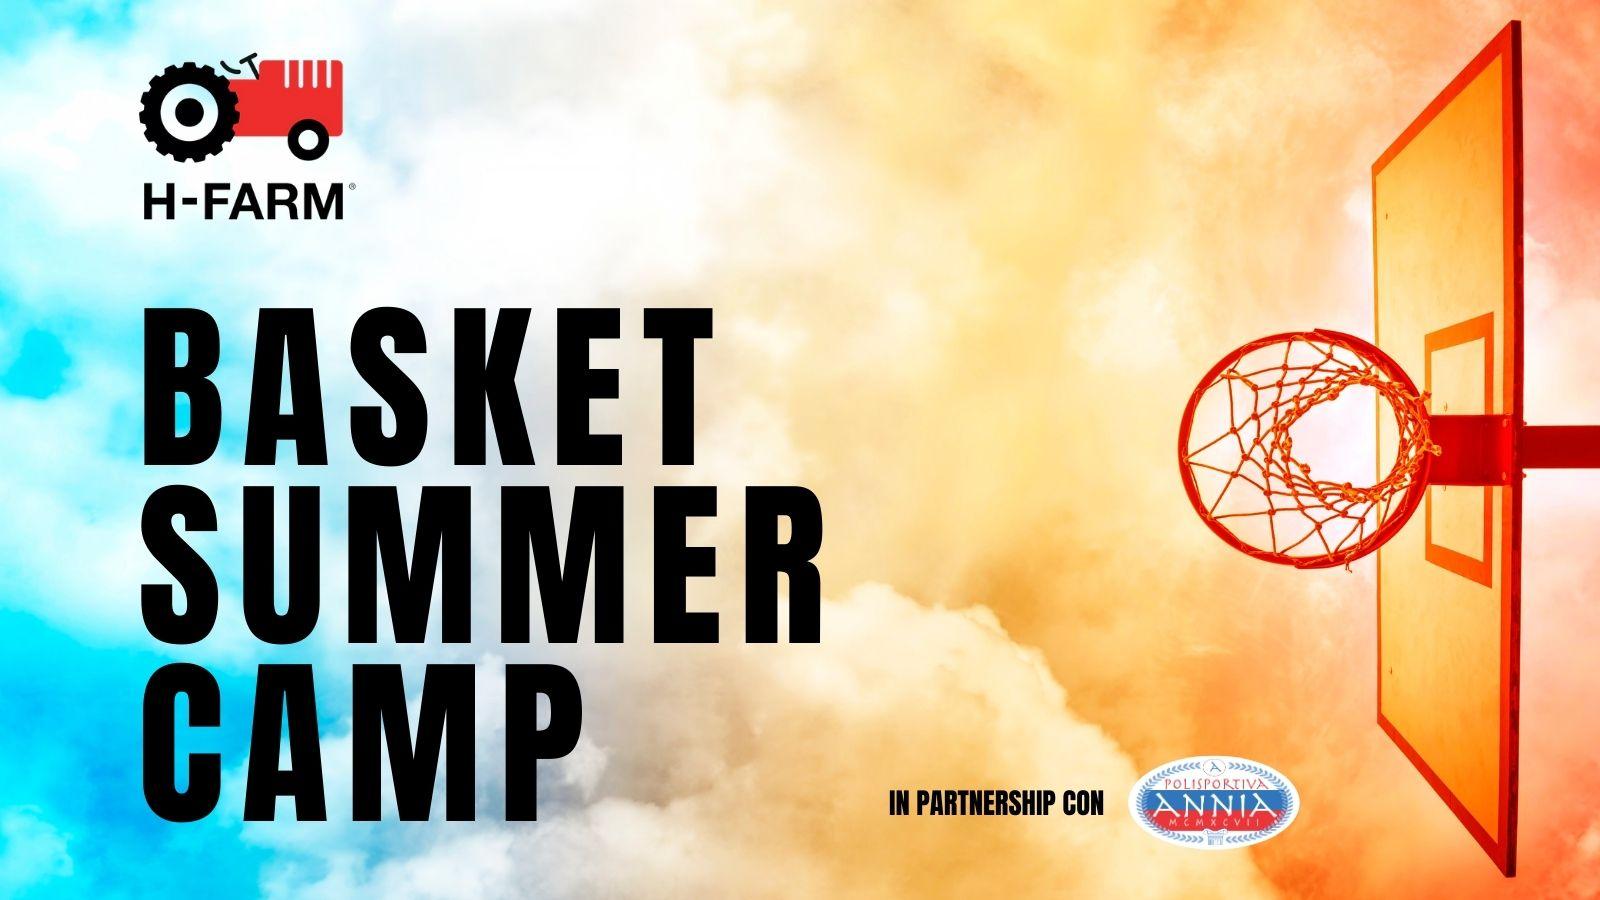 banner Basket Summer Camp H-FARM